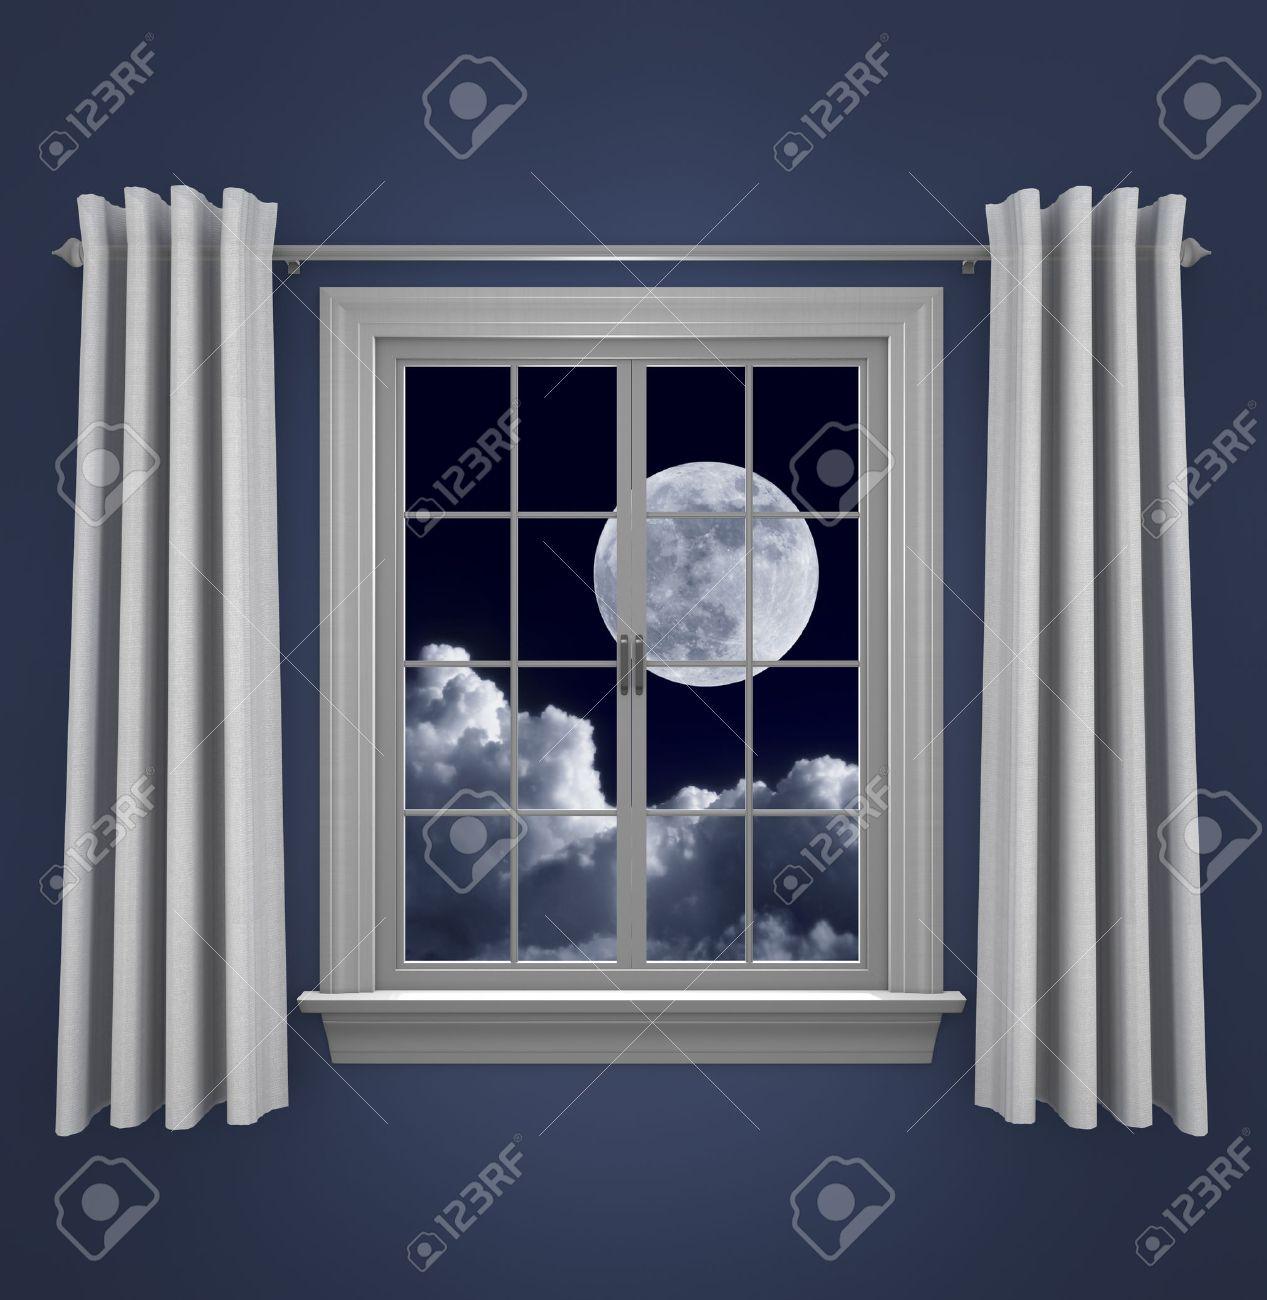 Full Moon In Night Sky Shining Beautifully Through A Bedroom Window Stock  Photo   35968054